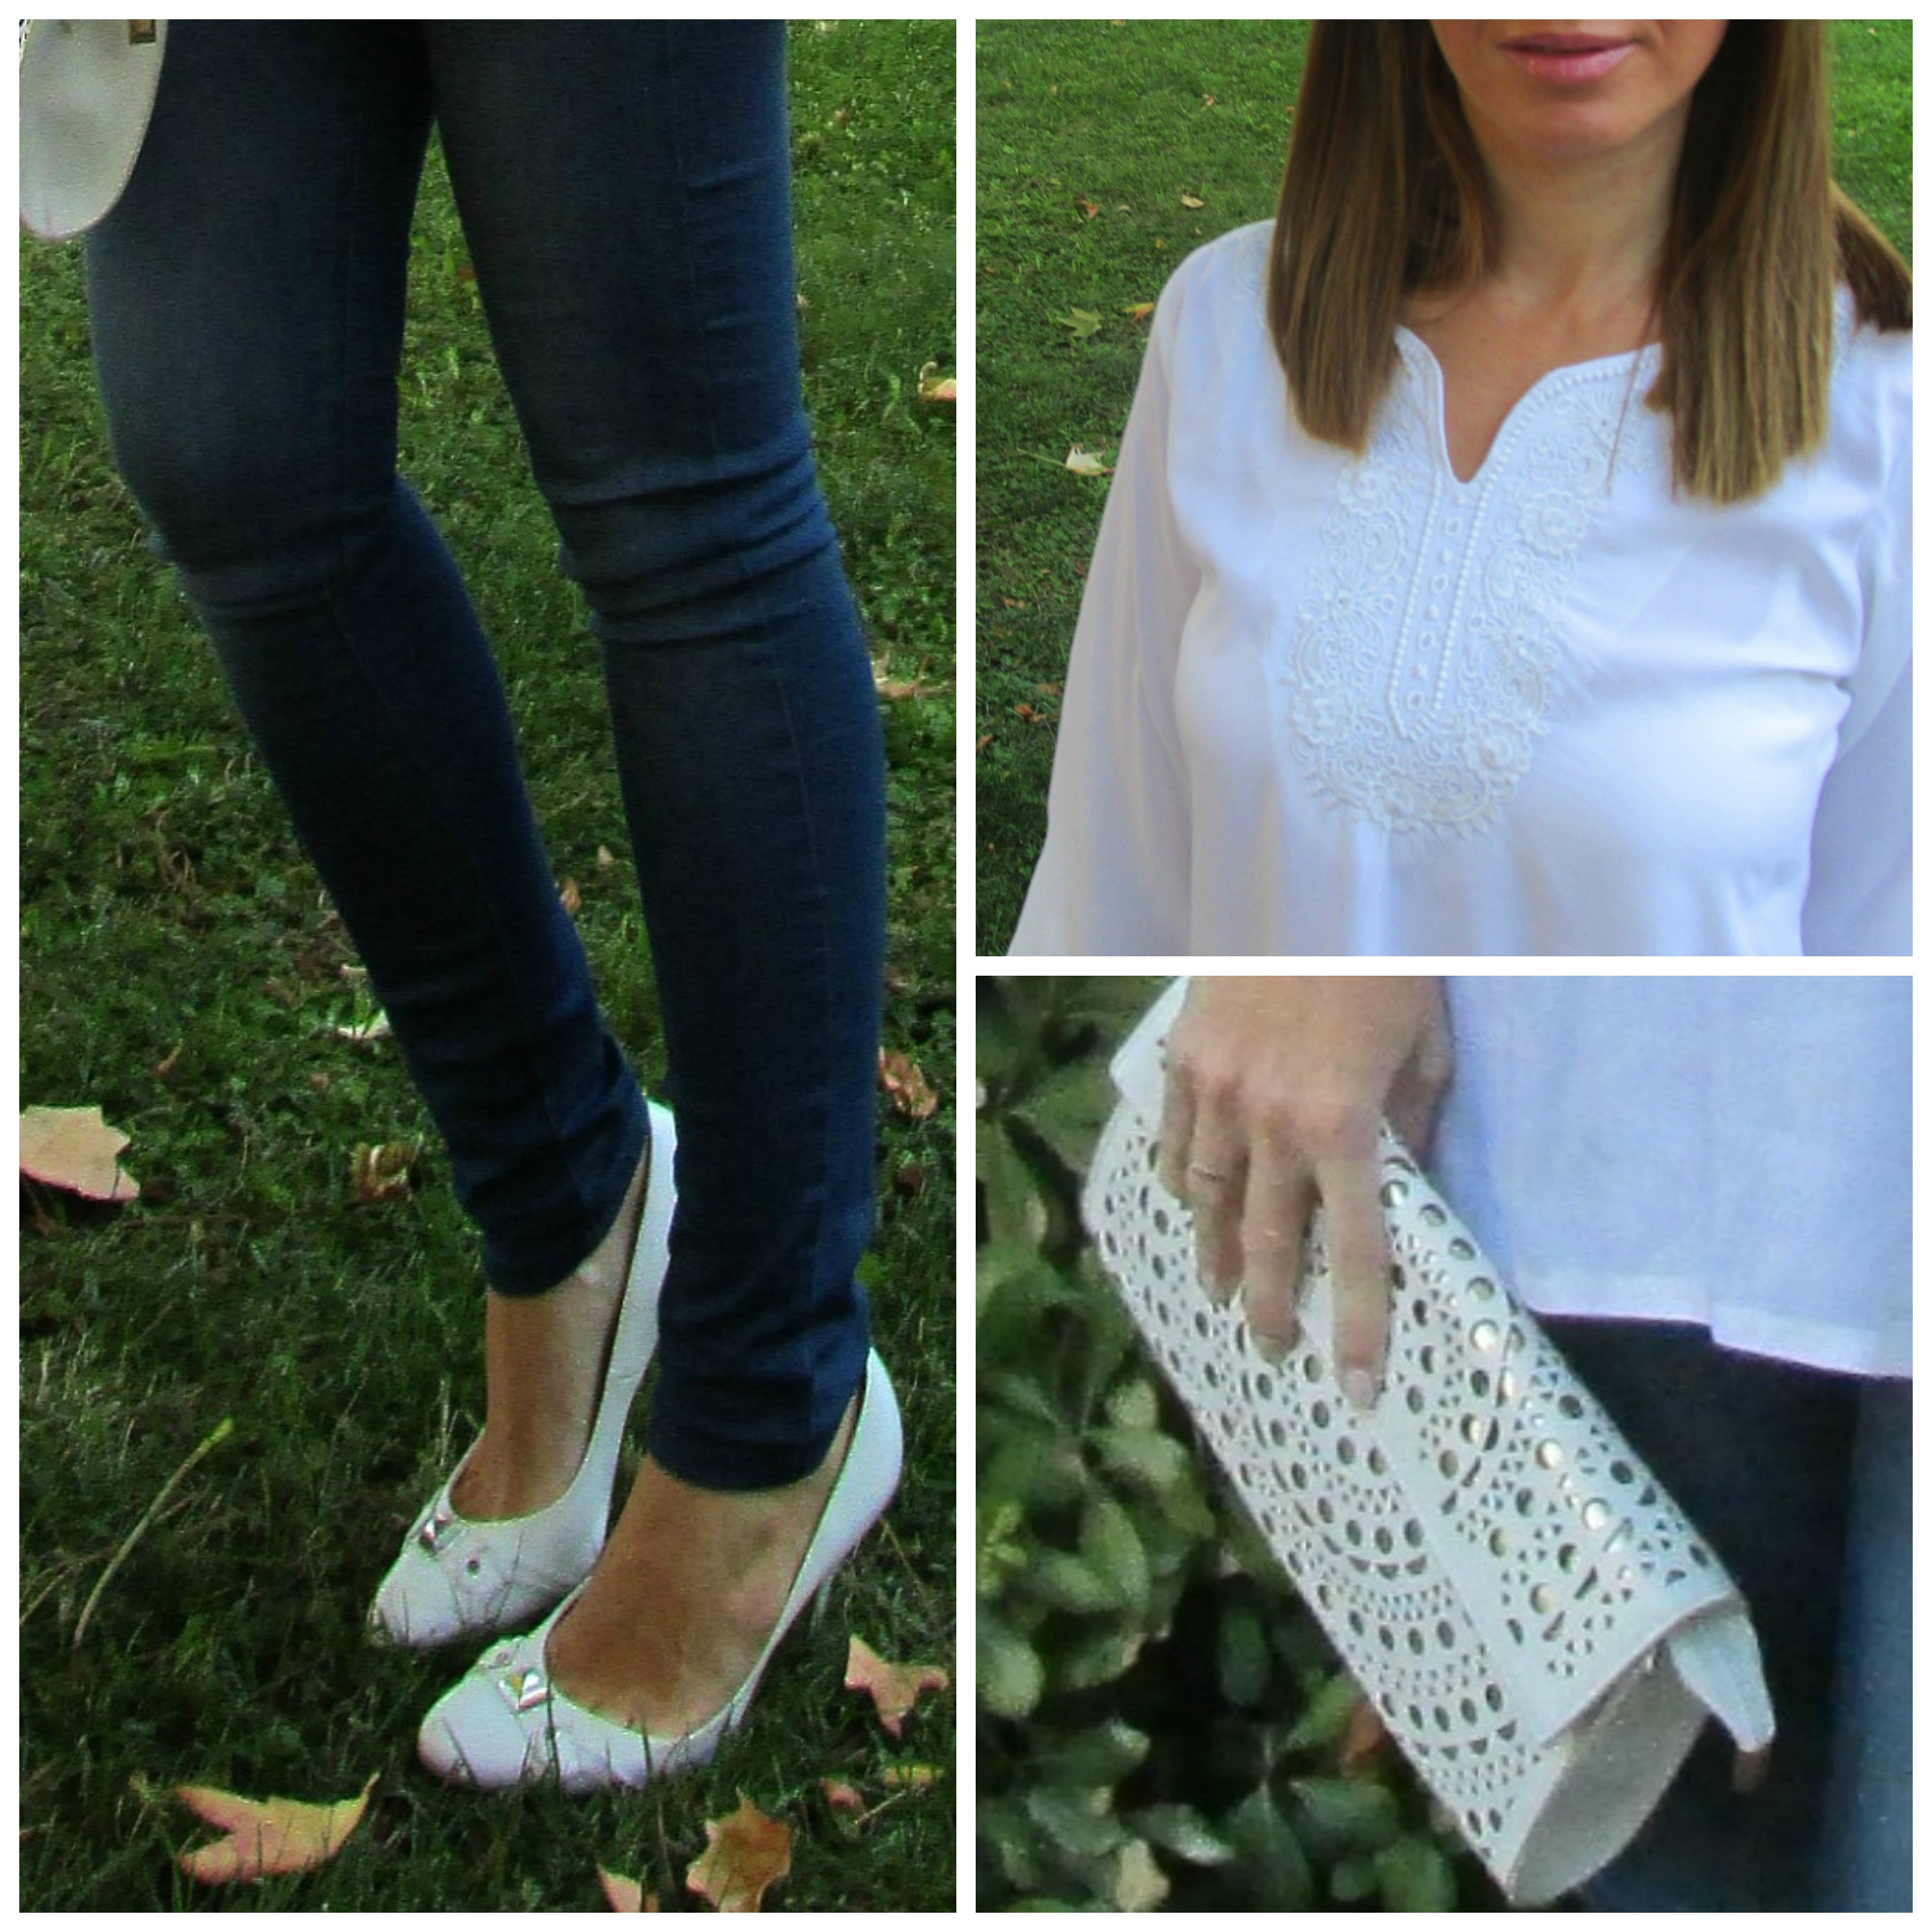 Jeans: ABERCROMBIE; Shoes: FOSCO; Handbag: VINTAGE; BLOUSE: (BOUGHT IN DUBAI);Sunnies:RAY-BAN